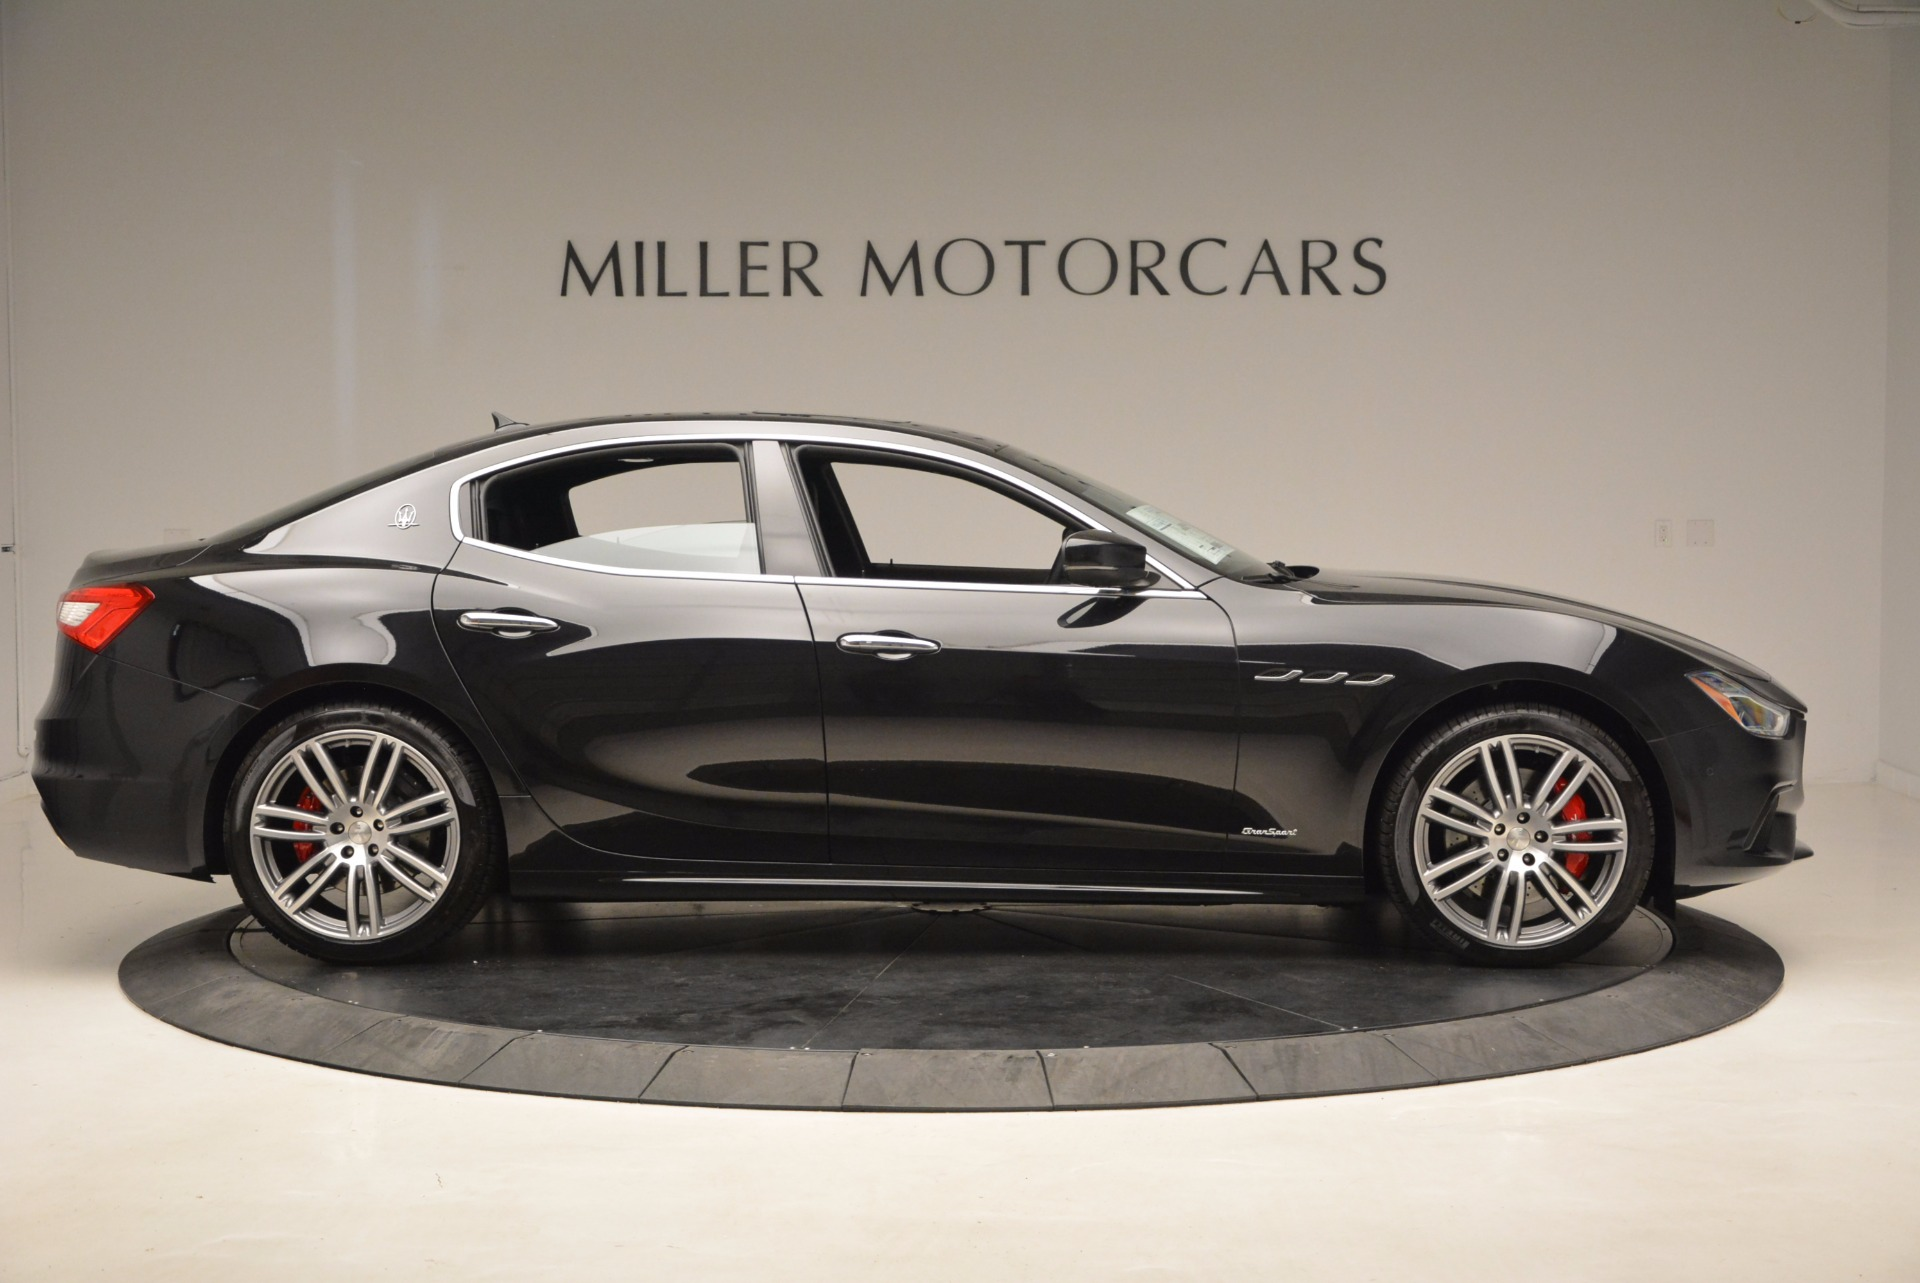 New 2018 Maserati Ghibli S Q4 Gransport For Sale In Westport, CT 1855_p9